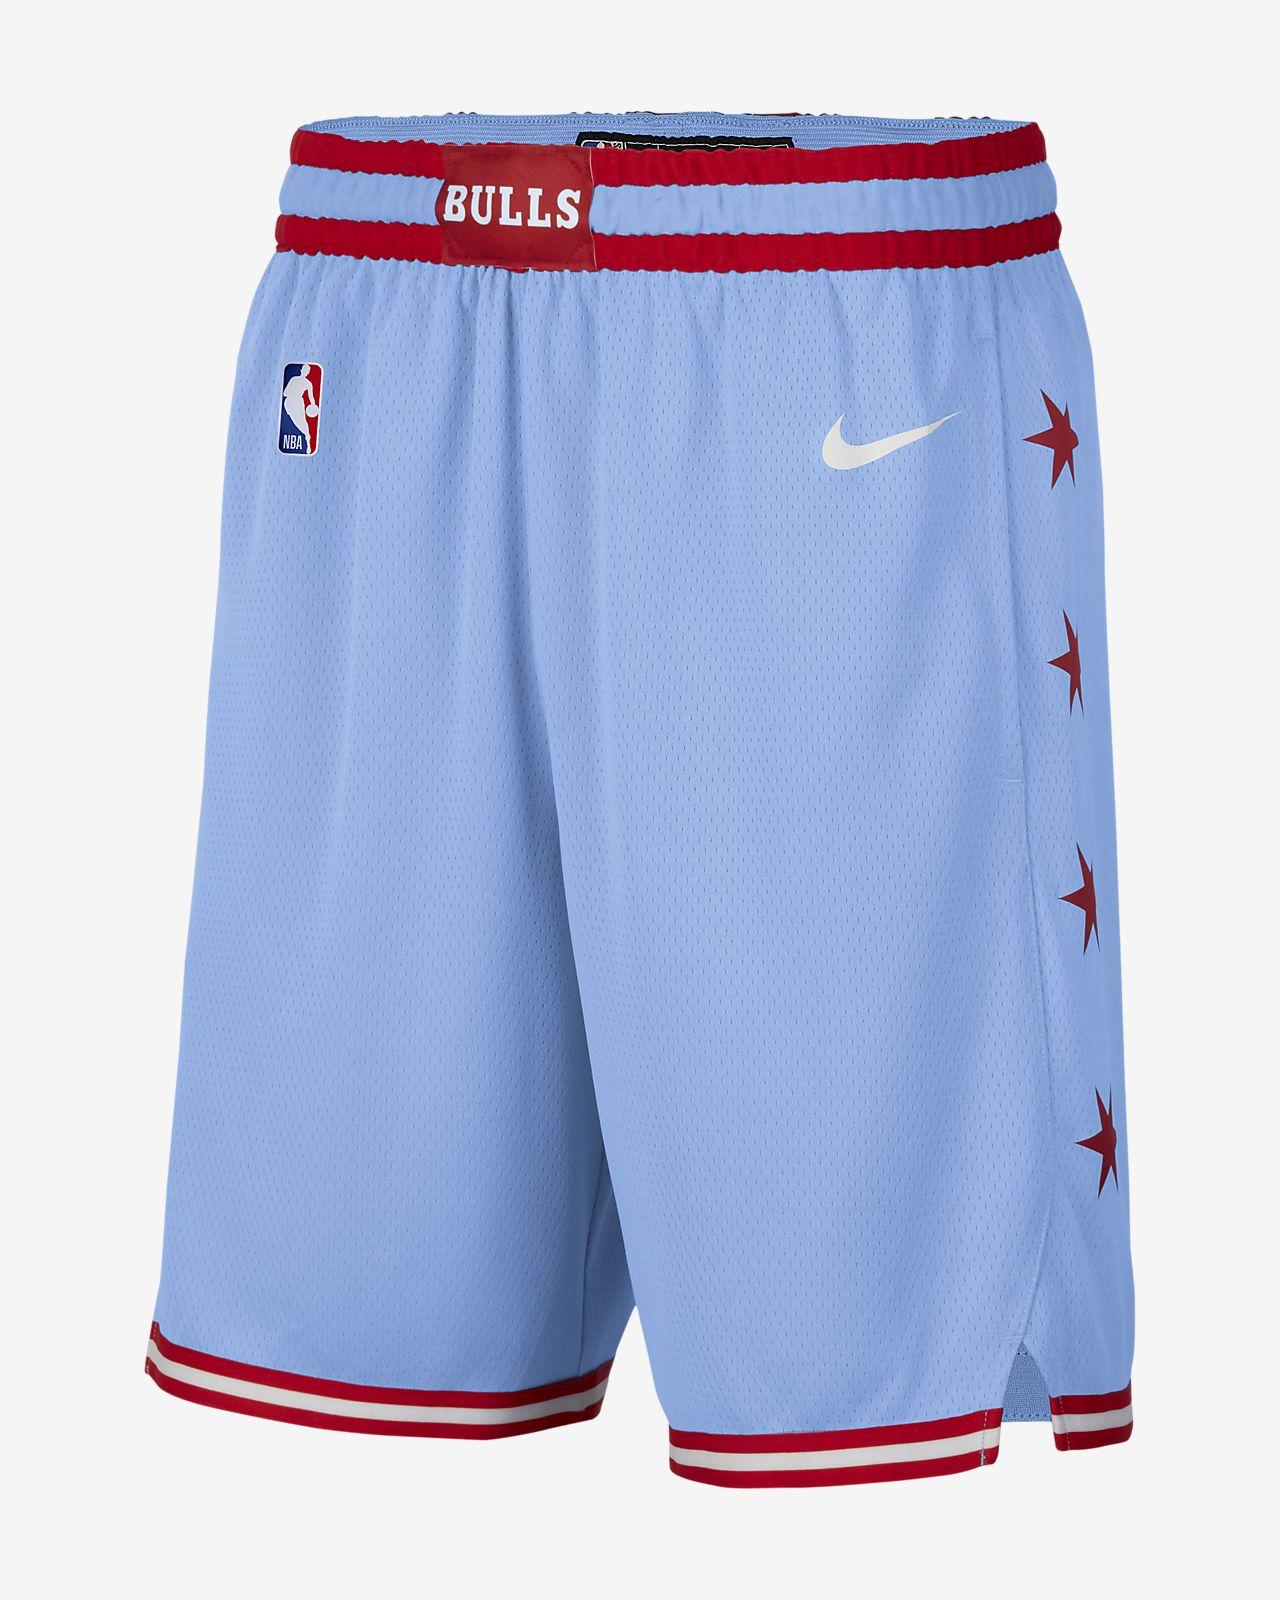 Bulls City Edition Swingman Nike NBA shorts